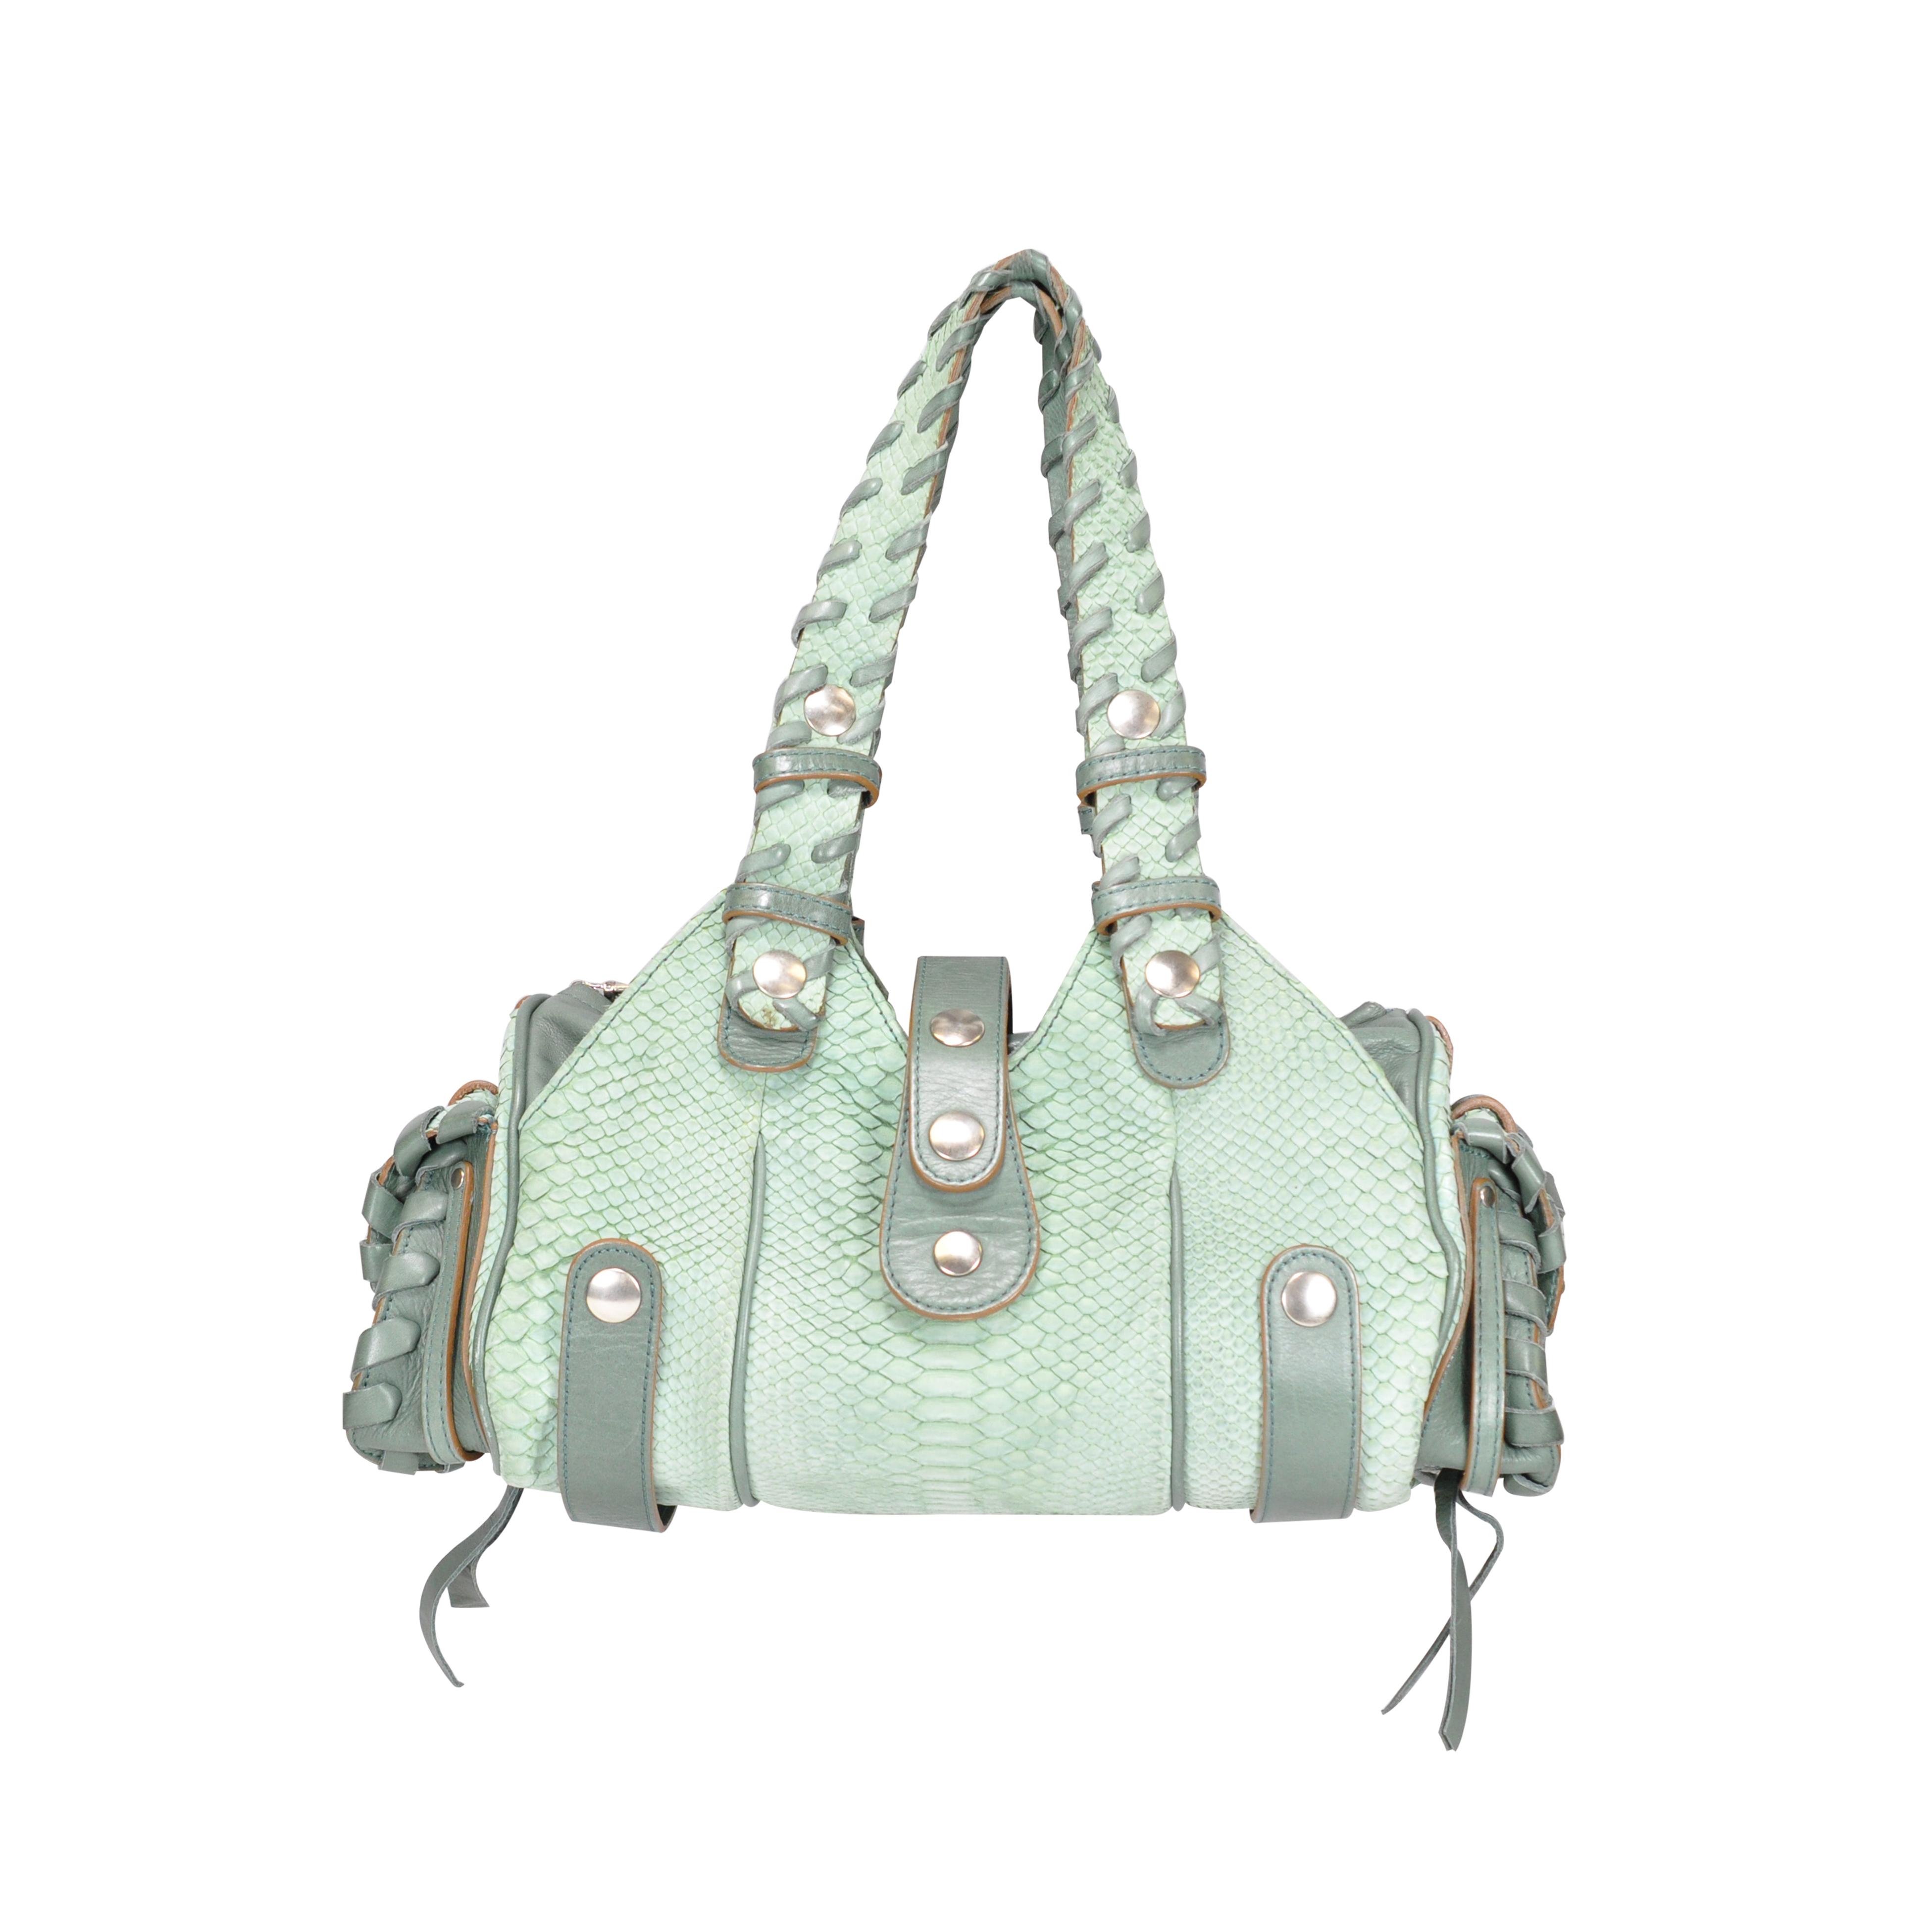 Authentic Pre Owned Chloé Silverado Python Bag (PSS-047-00172)  3a4c4555c81b